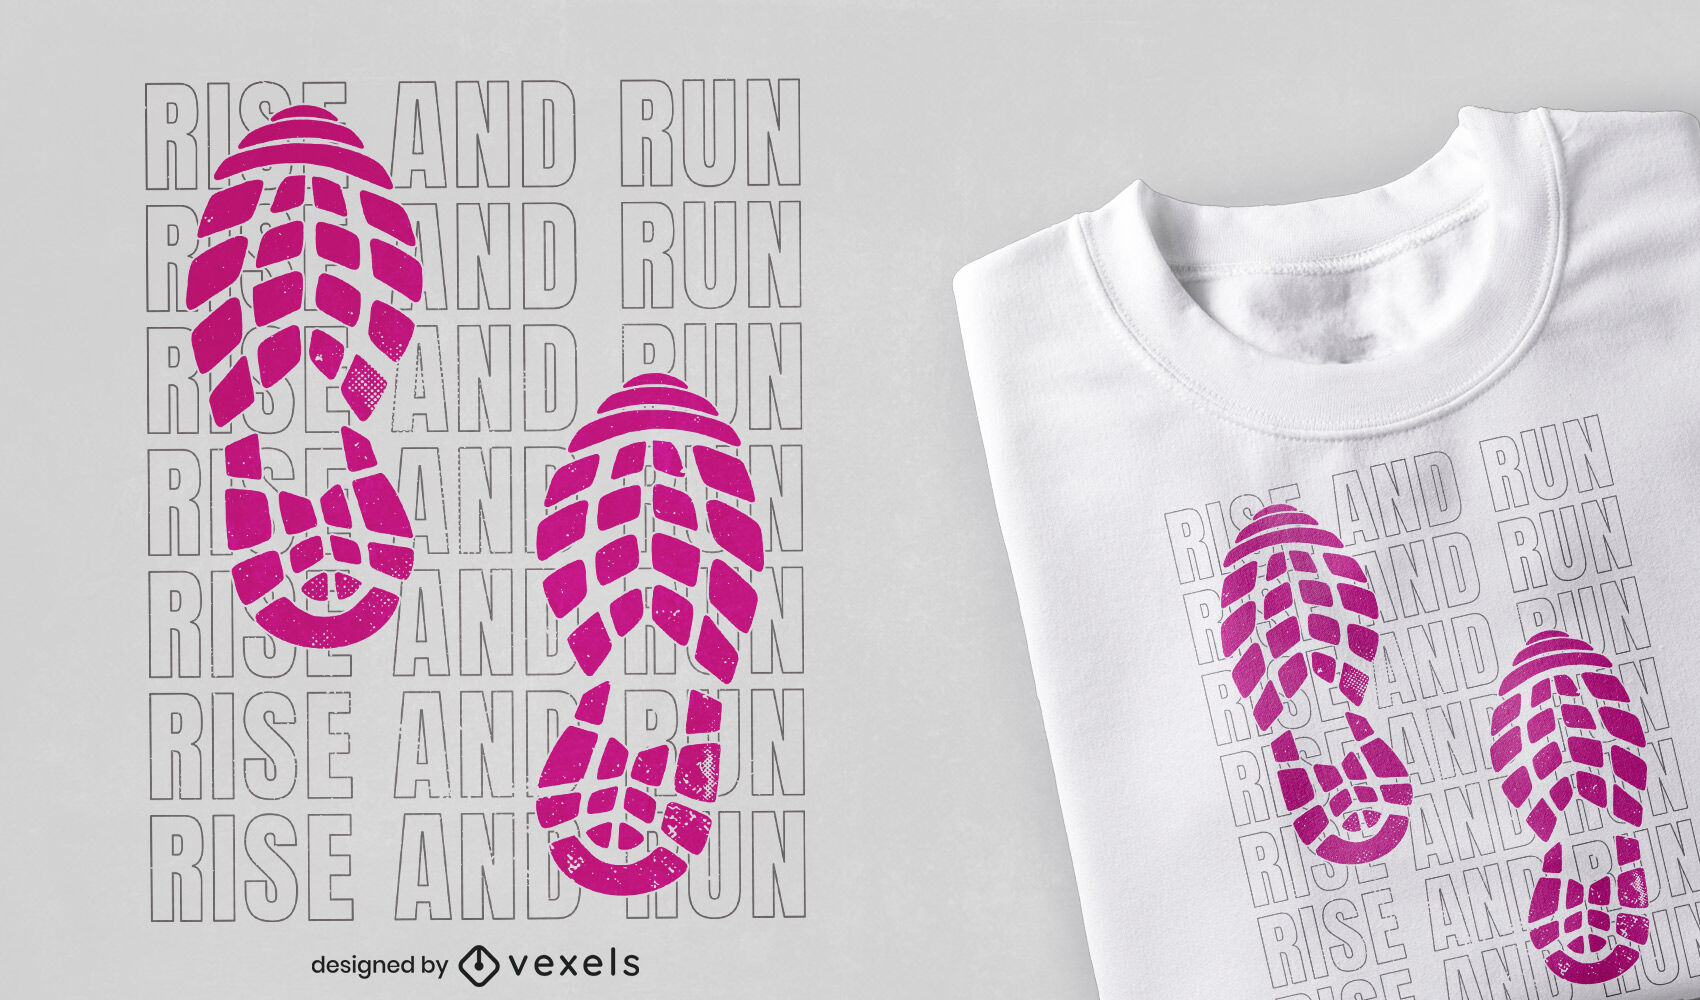 Shoe prints running t-shirt design